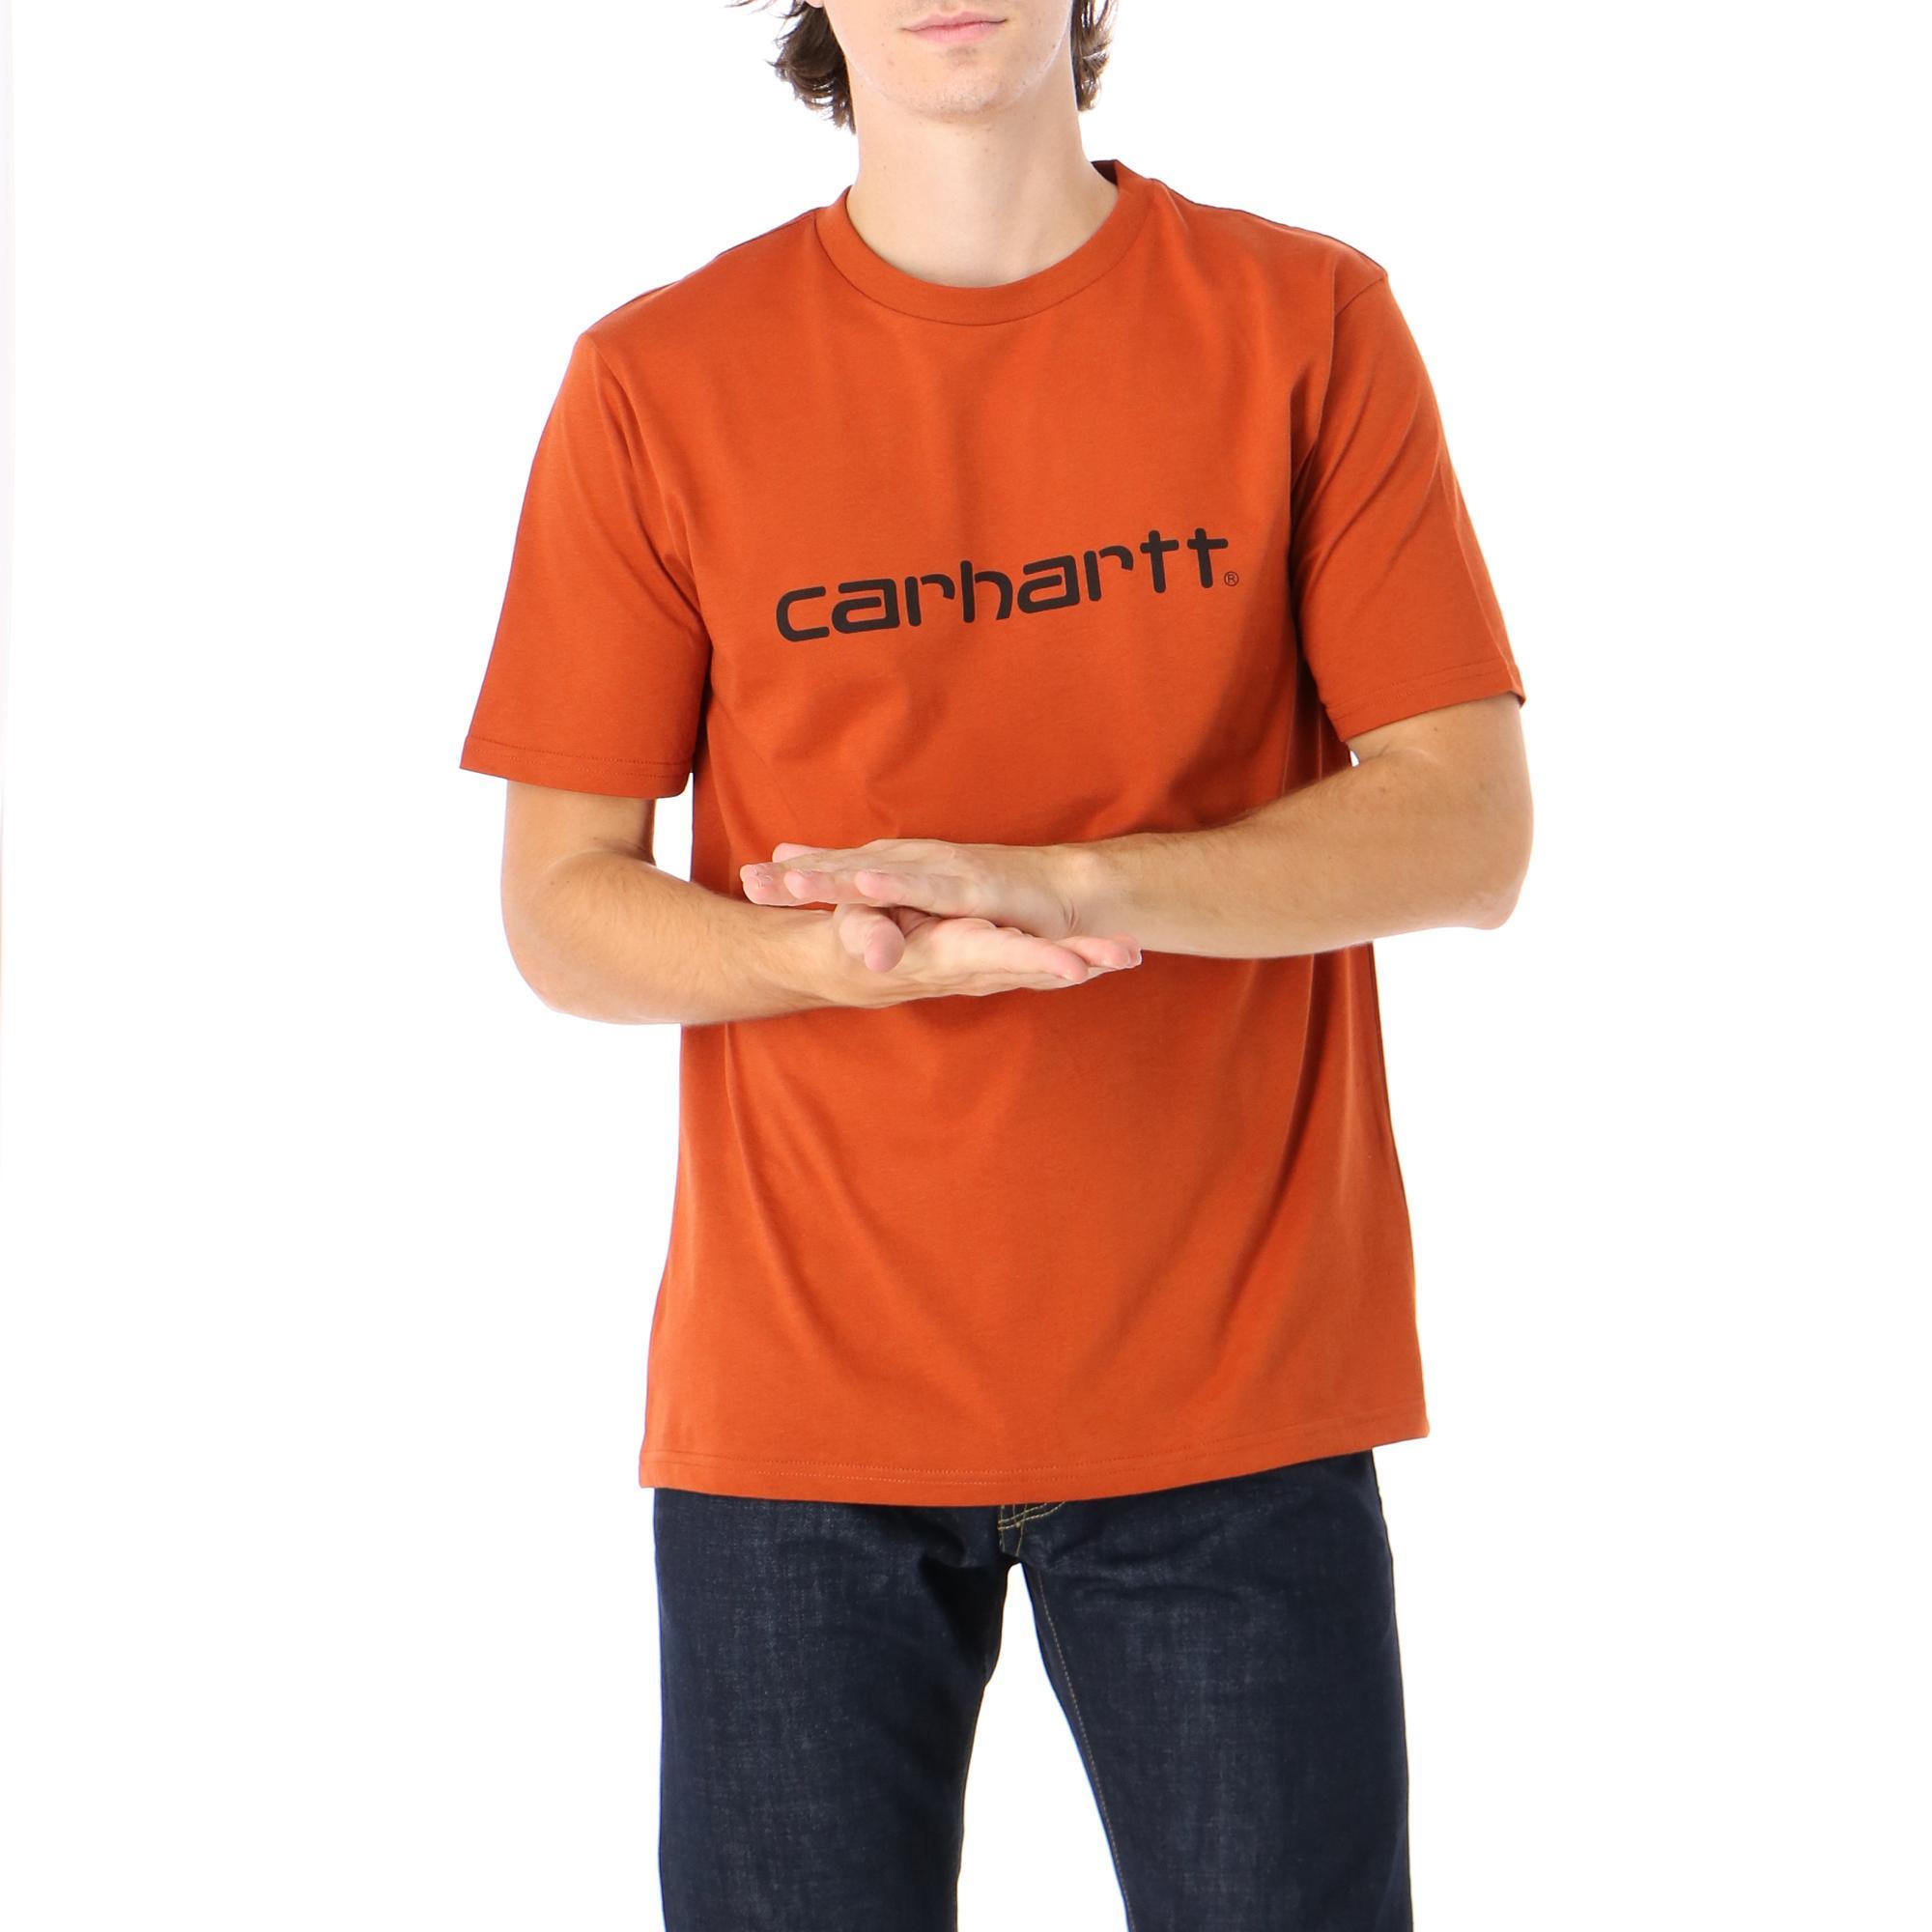 Carhartt S/s Script T-shirt Cinnamon black